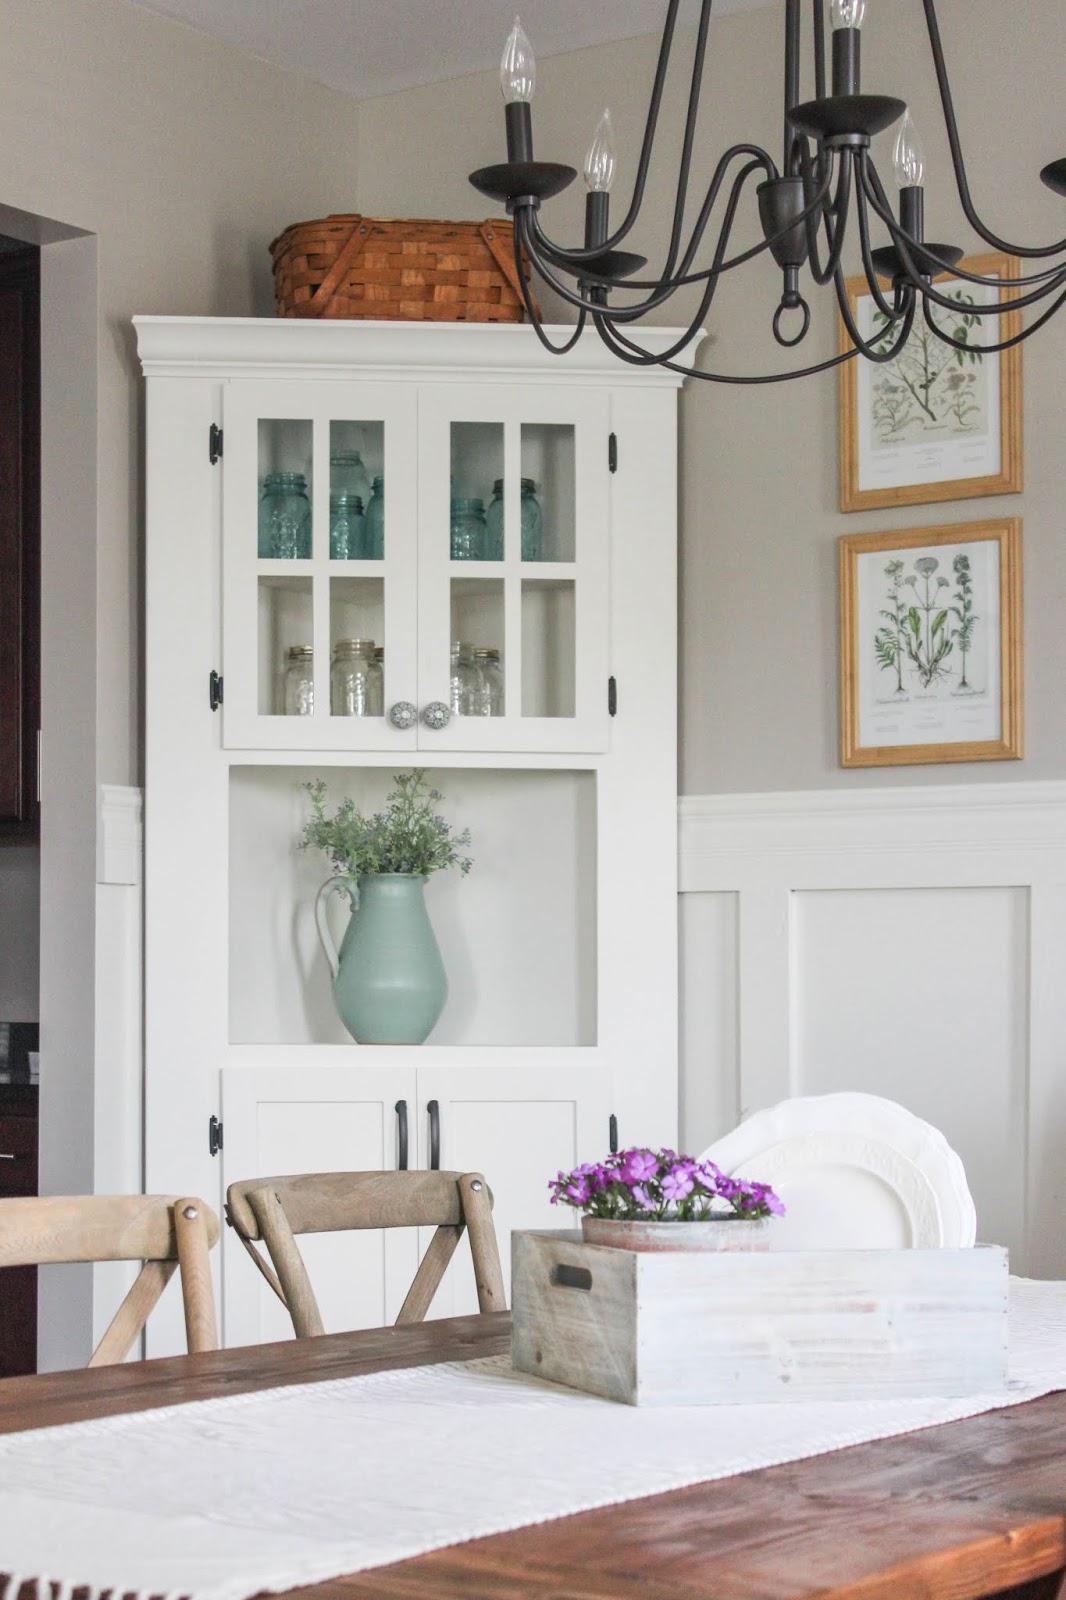 DIY Farmhouse Corner Cabinet | Delightfully Noted